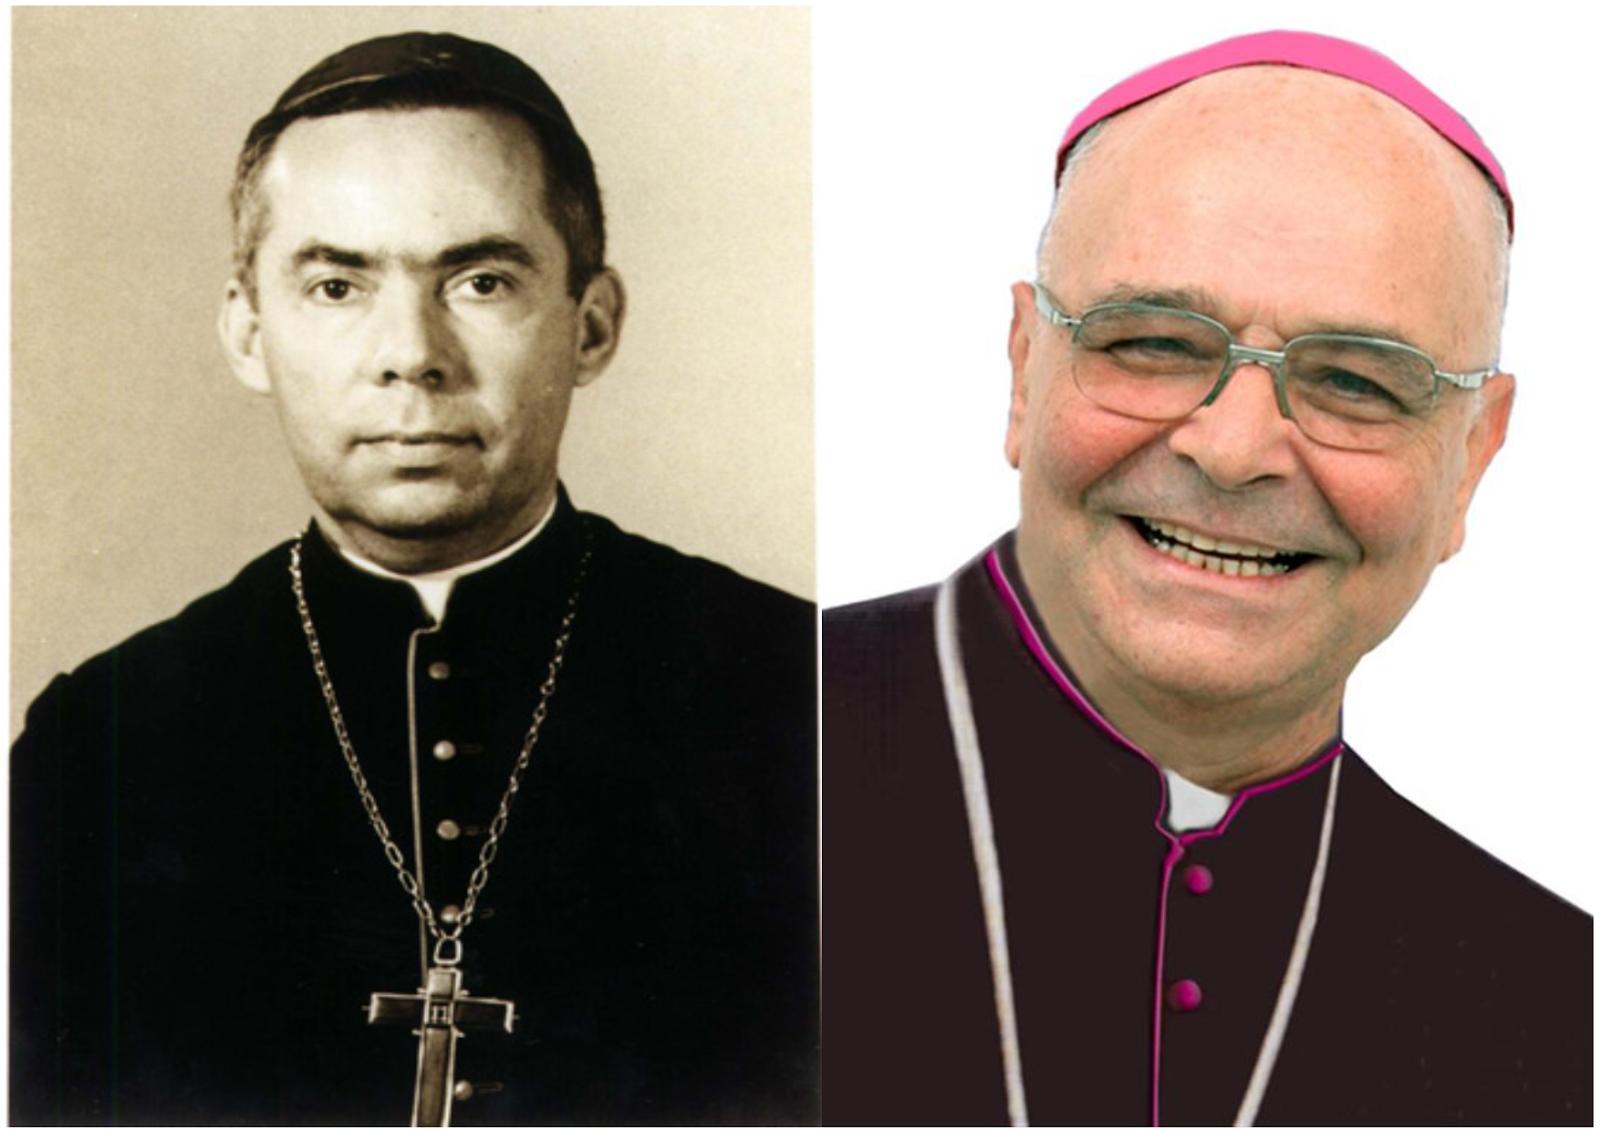 Arcebispos Emérito